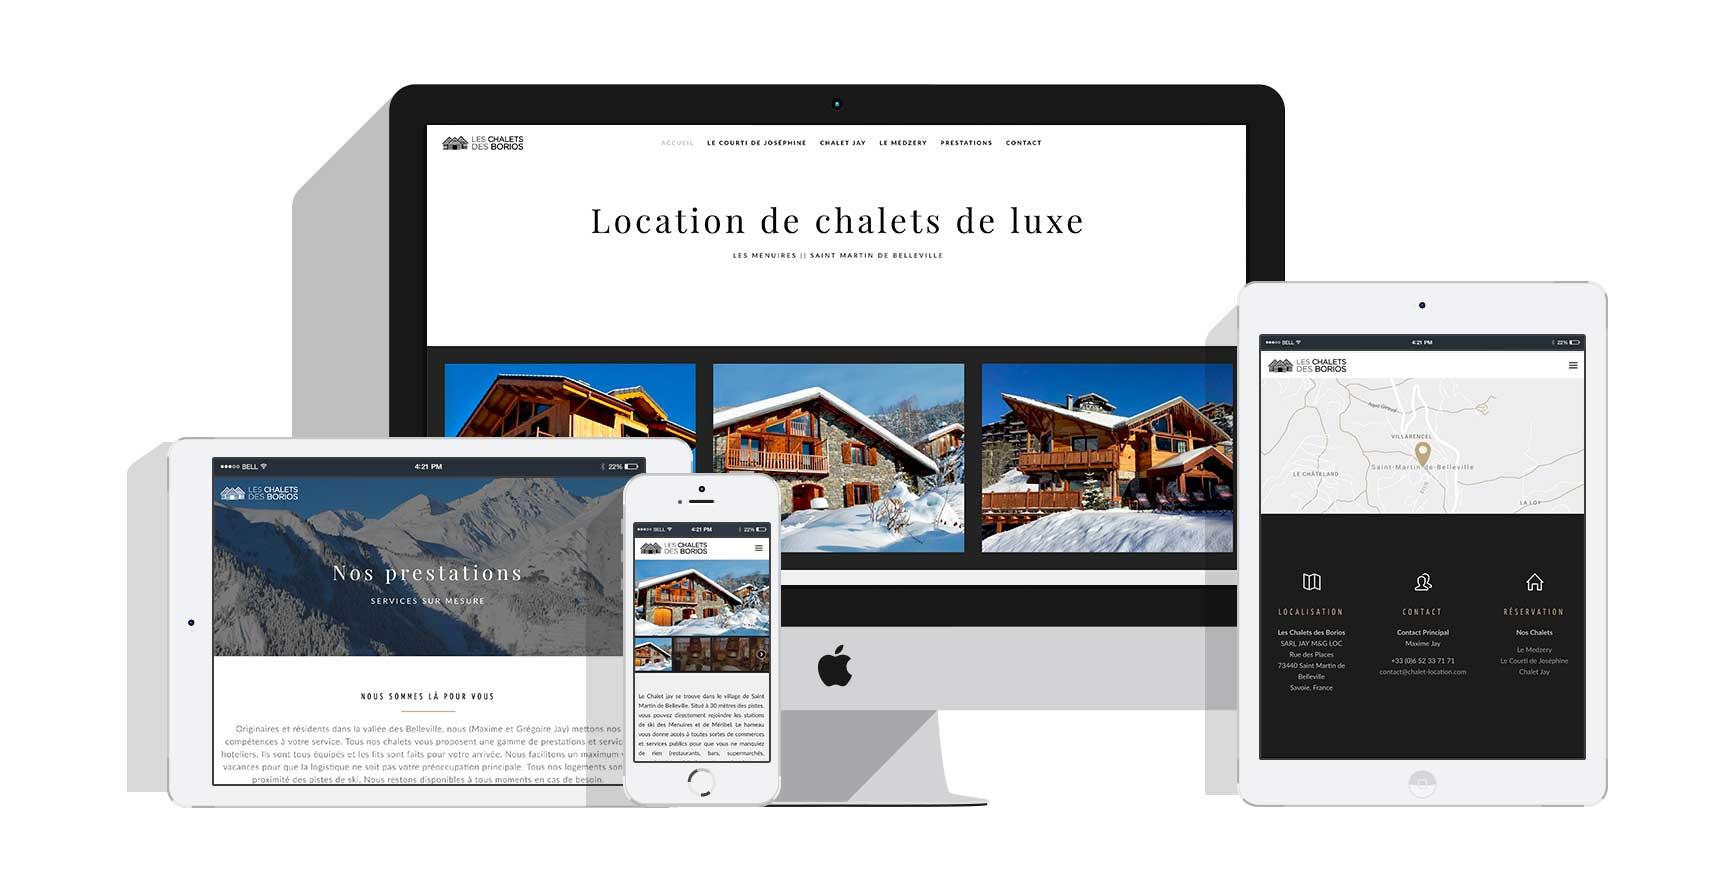 portfolio-chalet-location-borios-florence-borrel-flobo-design-graphique-infographie-webdesign-savoie-tarentaise-meribel-menuires-courchevel